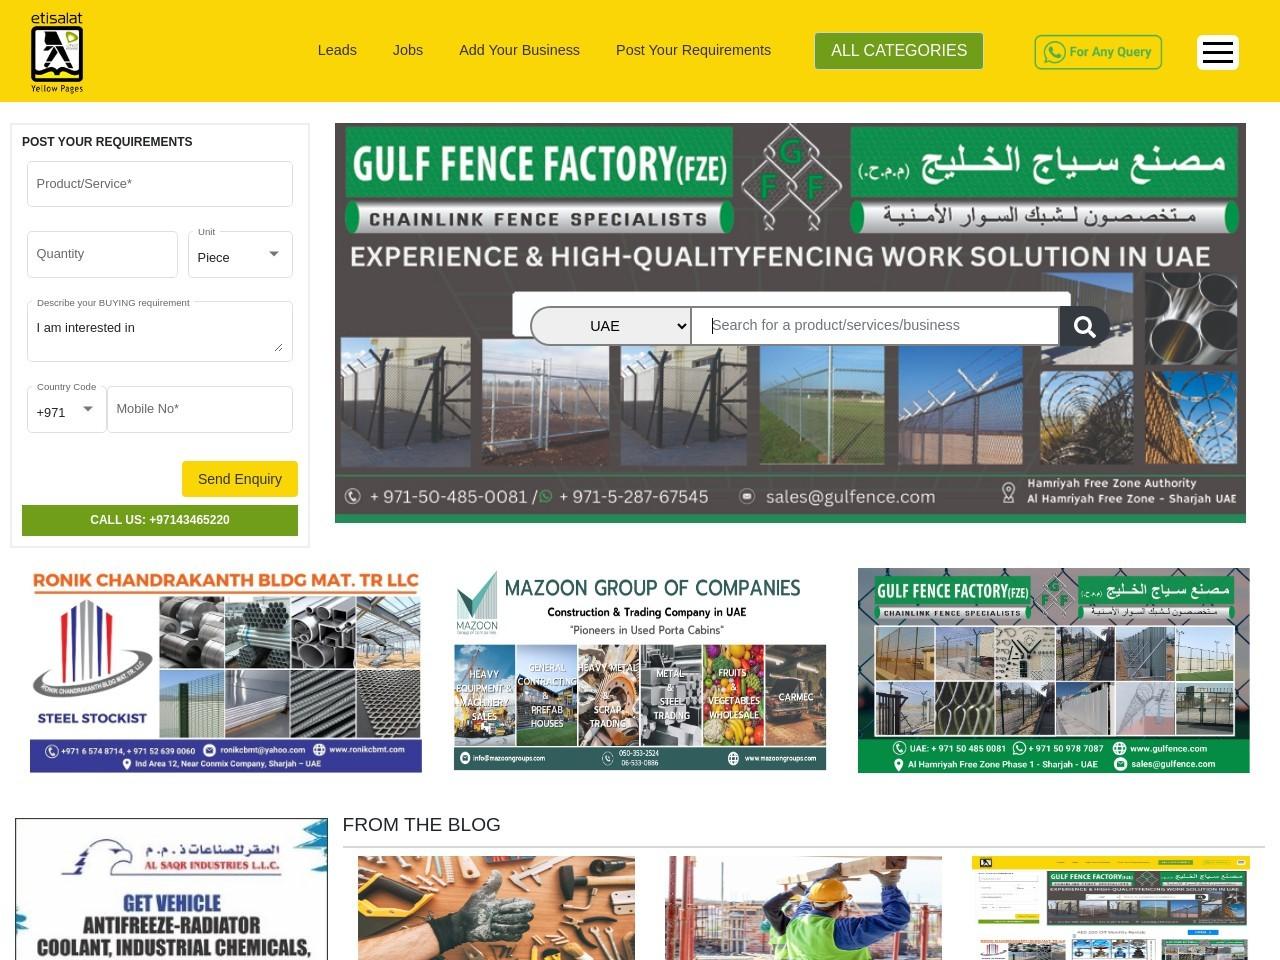 Best Water Treatment Equipment & Supplies in UAE